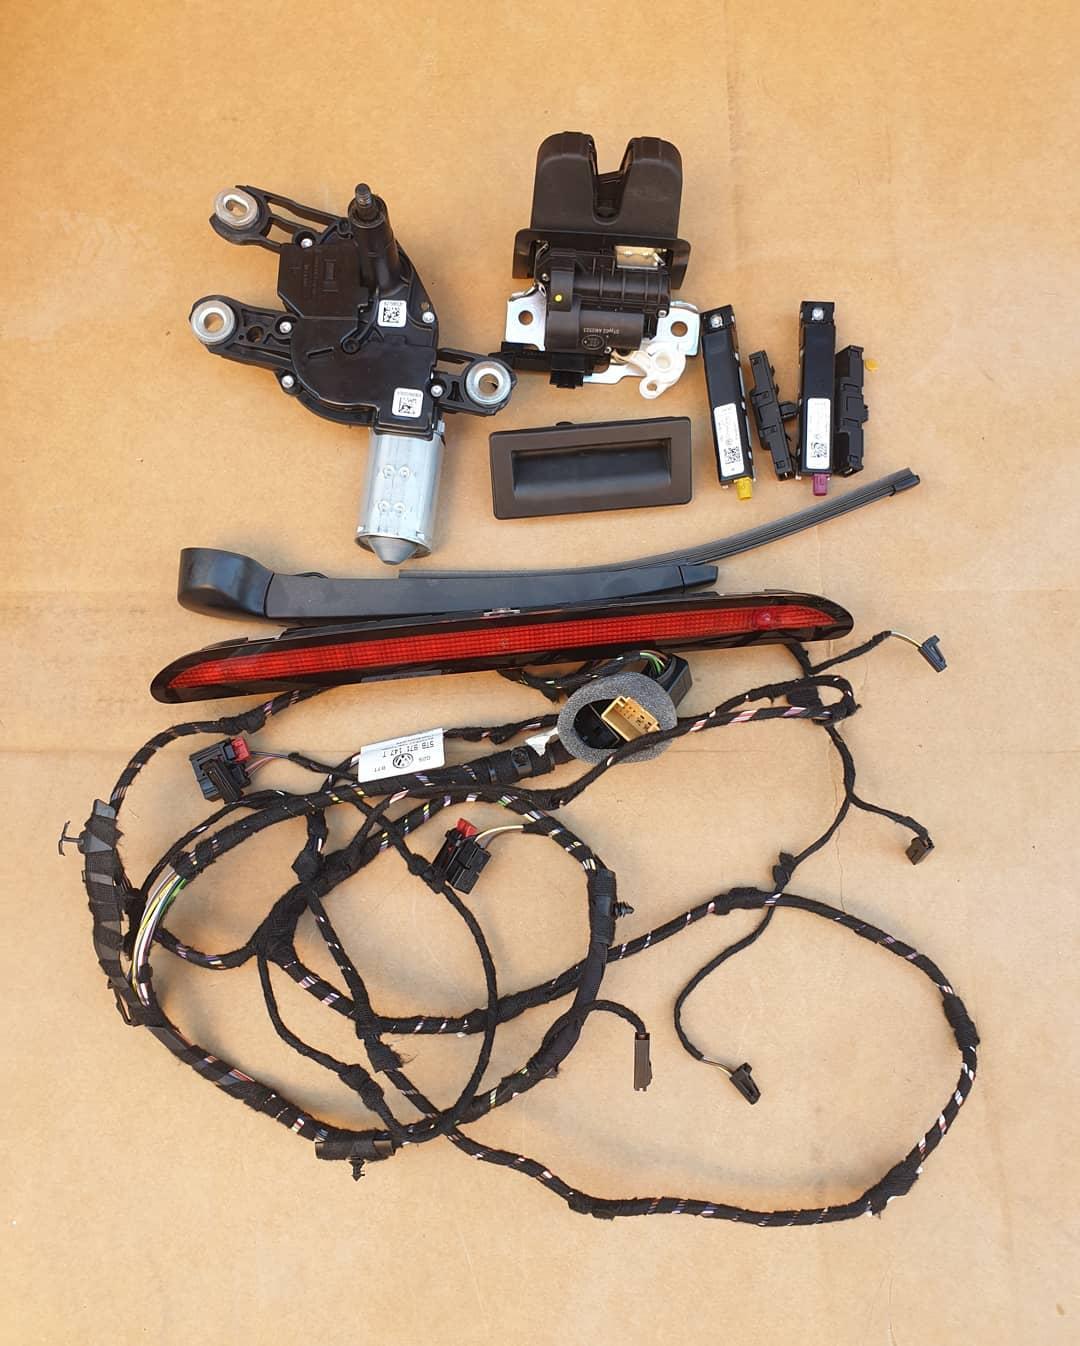 VW Touran Motoras stergator, maner deschidere, broasca, amplificator antena, filtru frecventa radio, stergator, stop frana si instalatie hayon